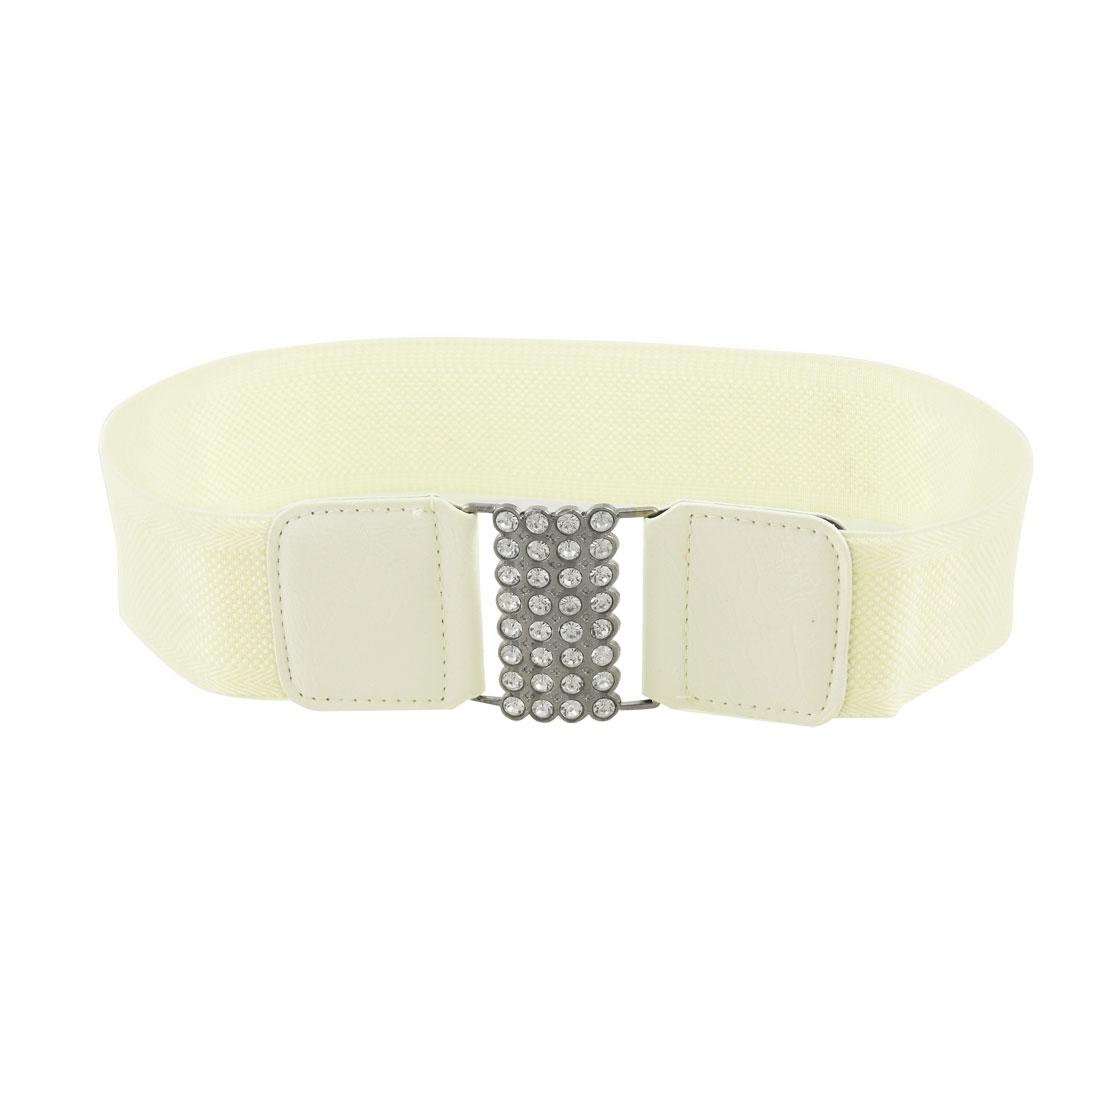 Dark Gray Metal Buckle Elastic Waist Belt Beige for Ladies